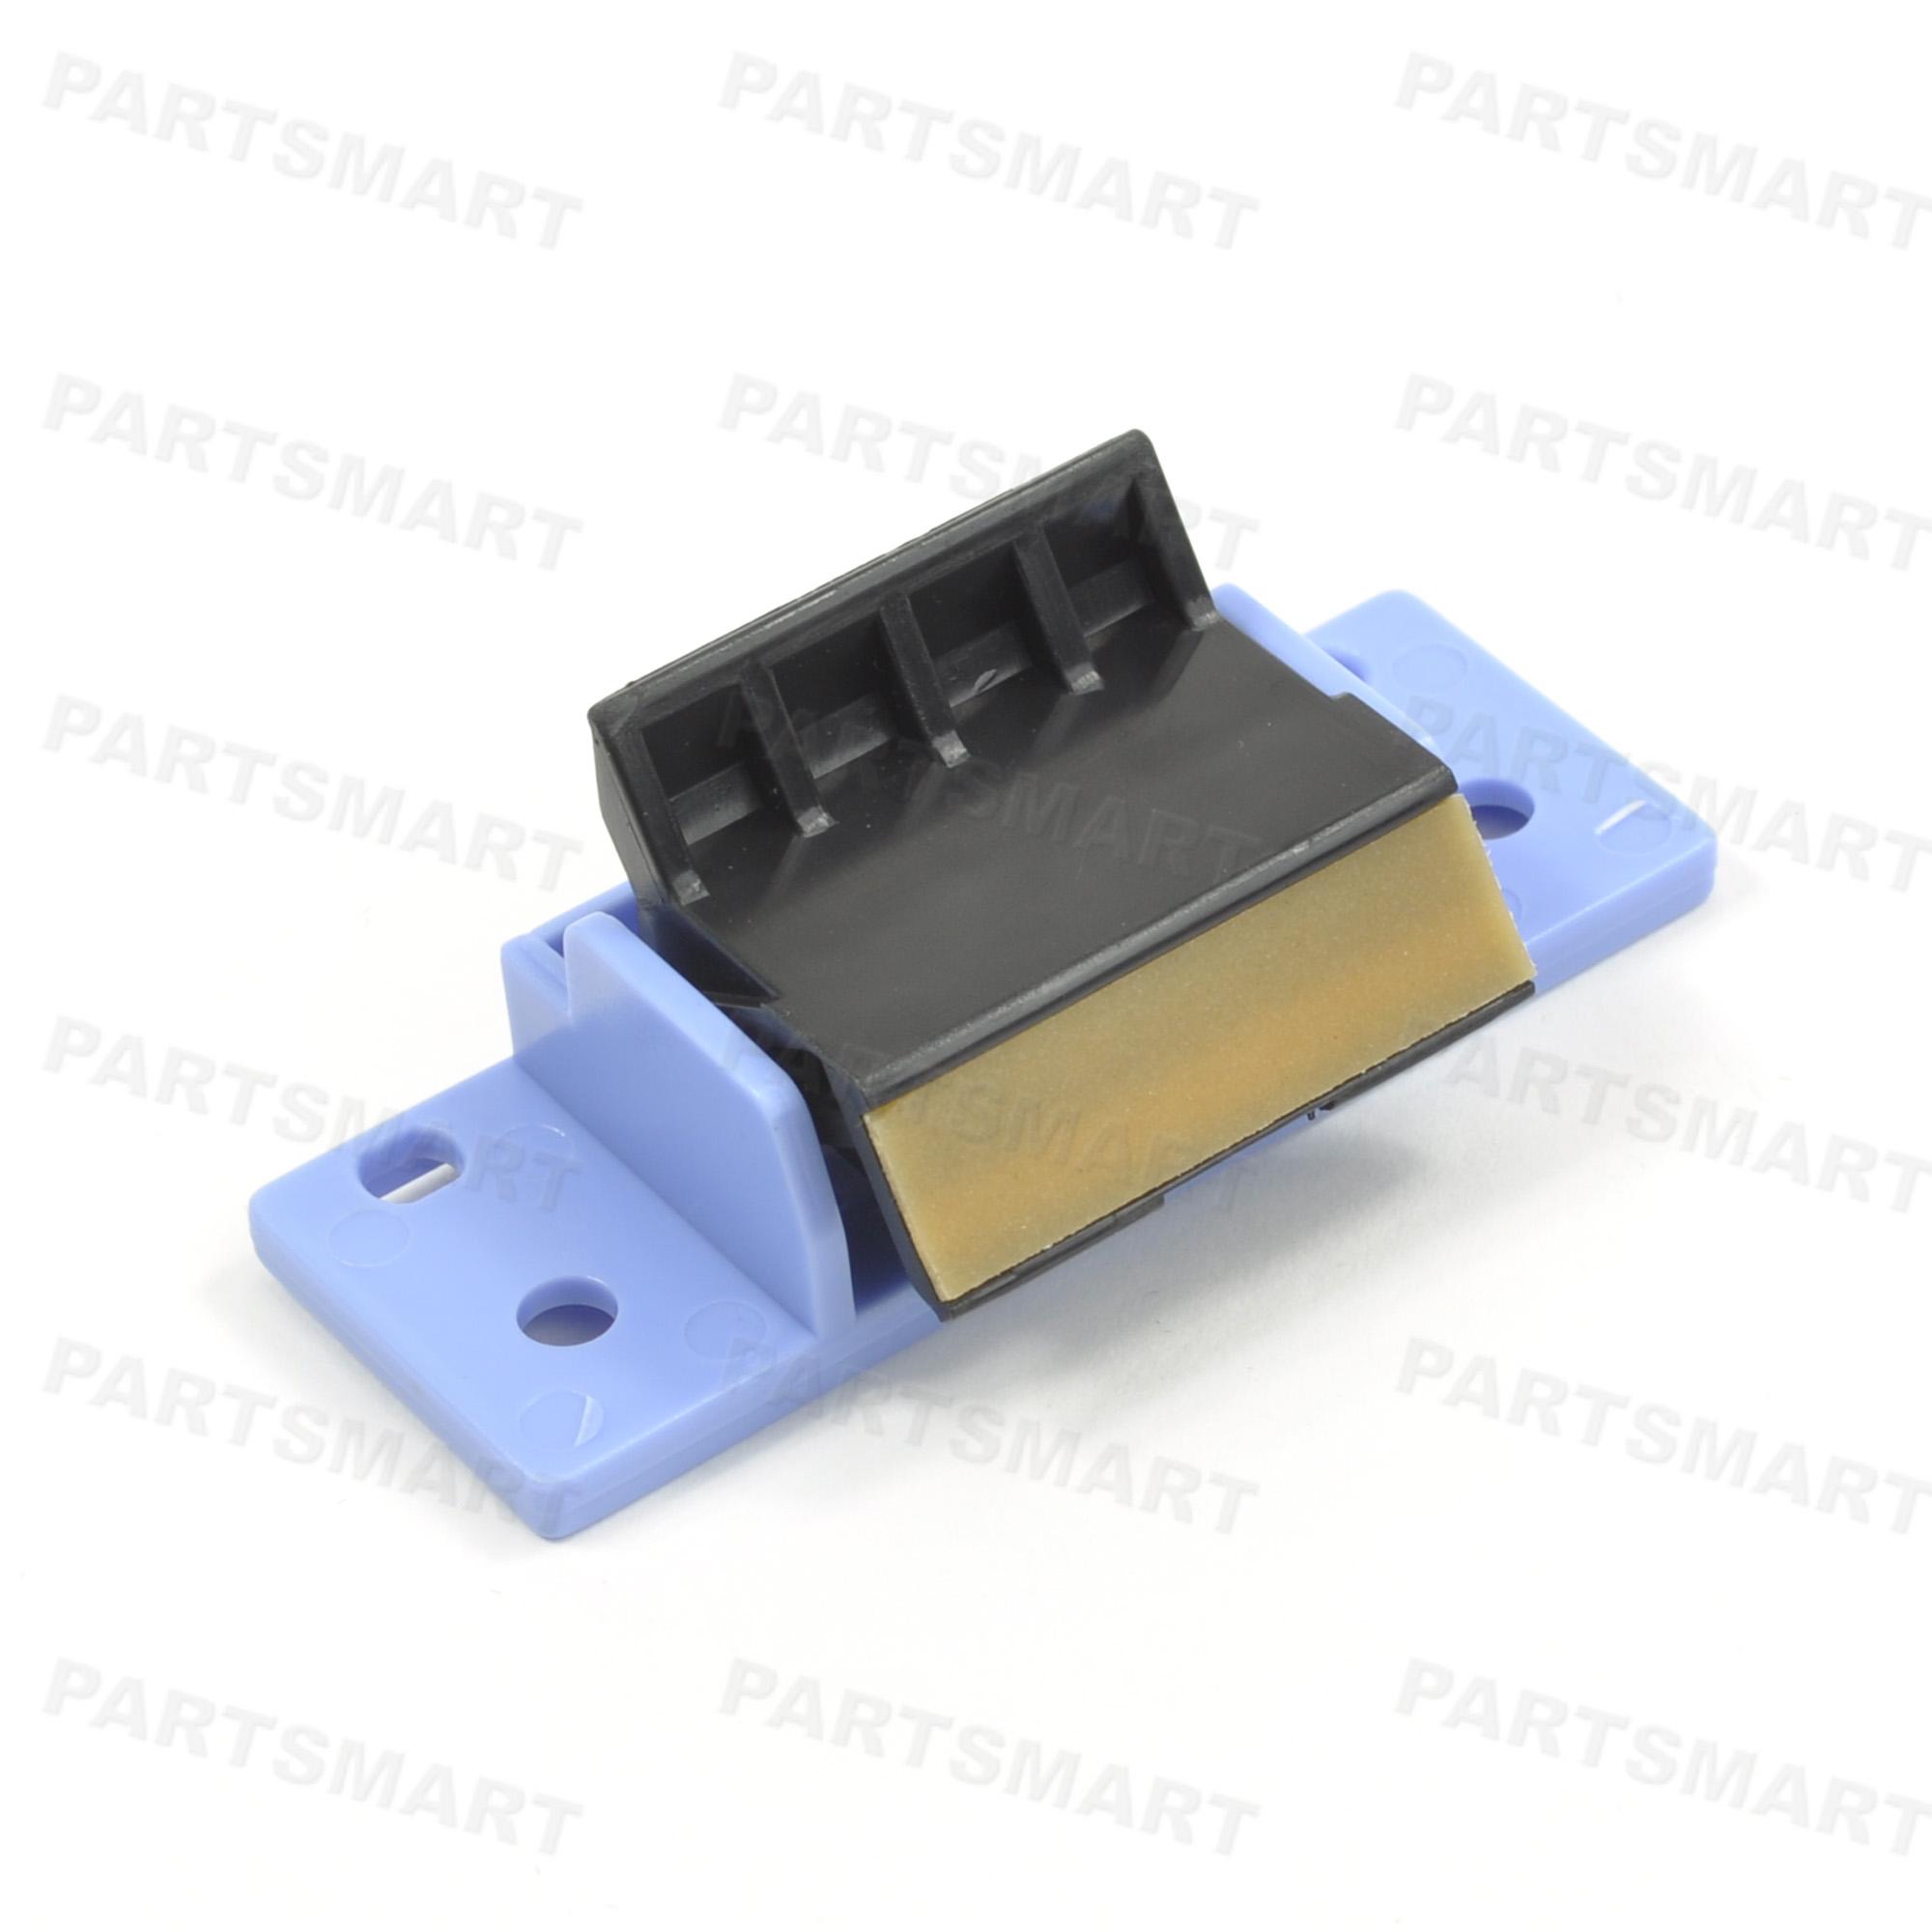 RM1-0648-000 Separation Pad Assembly for HP LaserJet 1010, LaserJet 1020